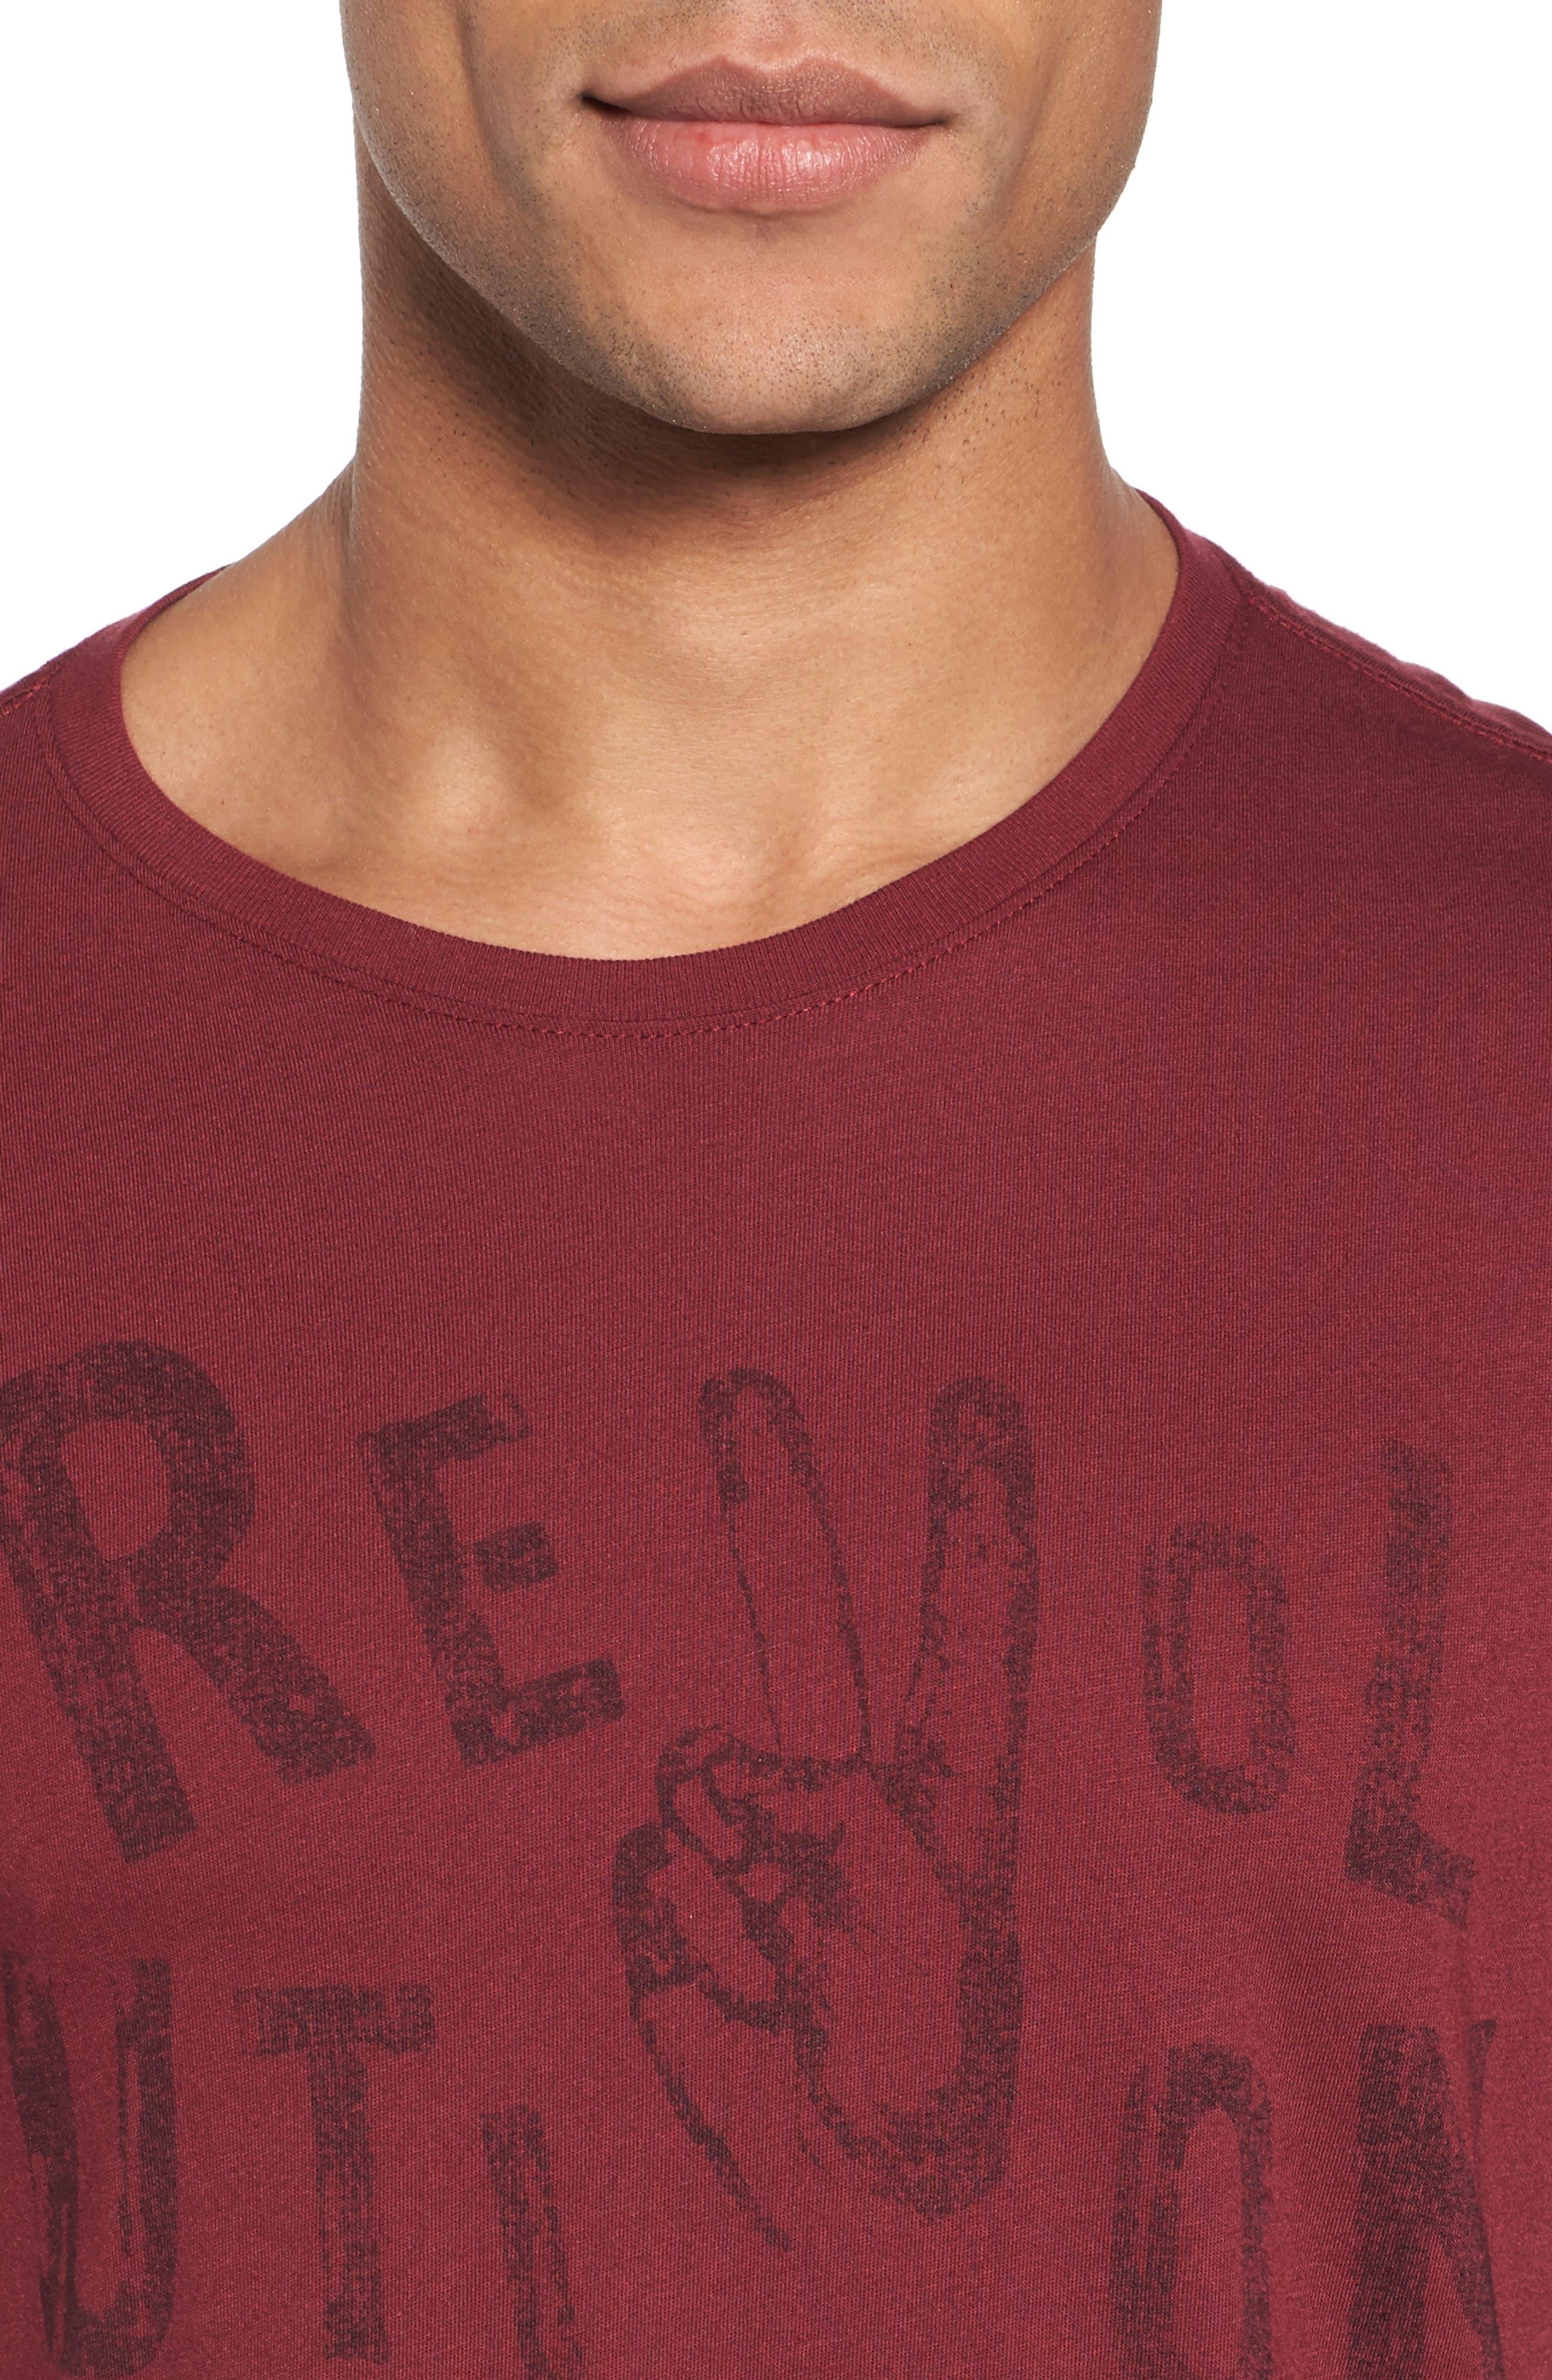 Revolution Graphic T-Shirt,                             Alternate thumbnail 8, color,